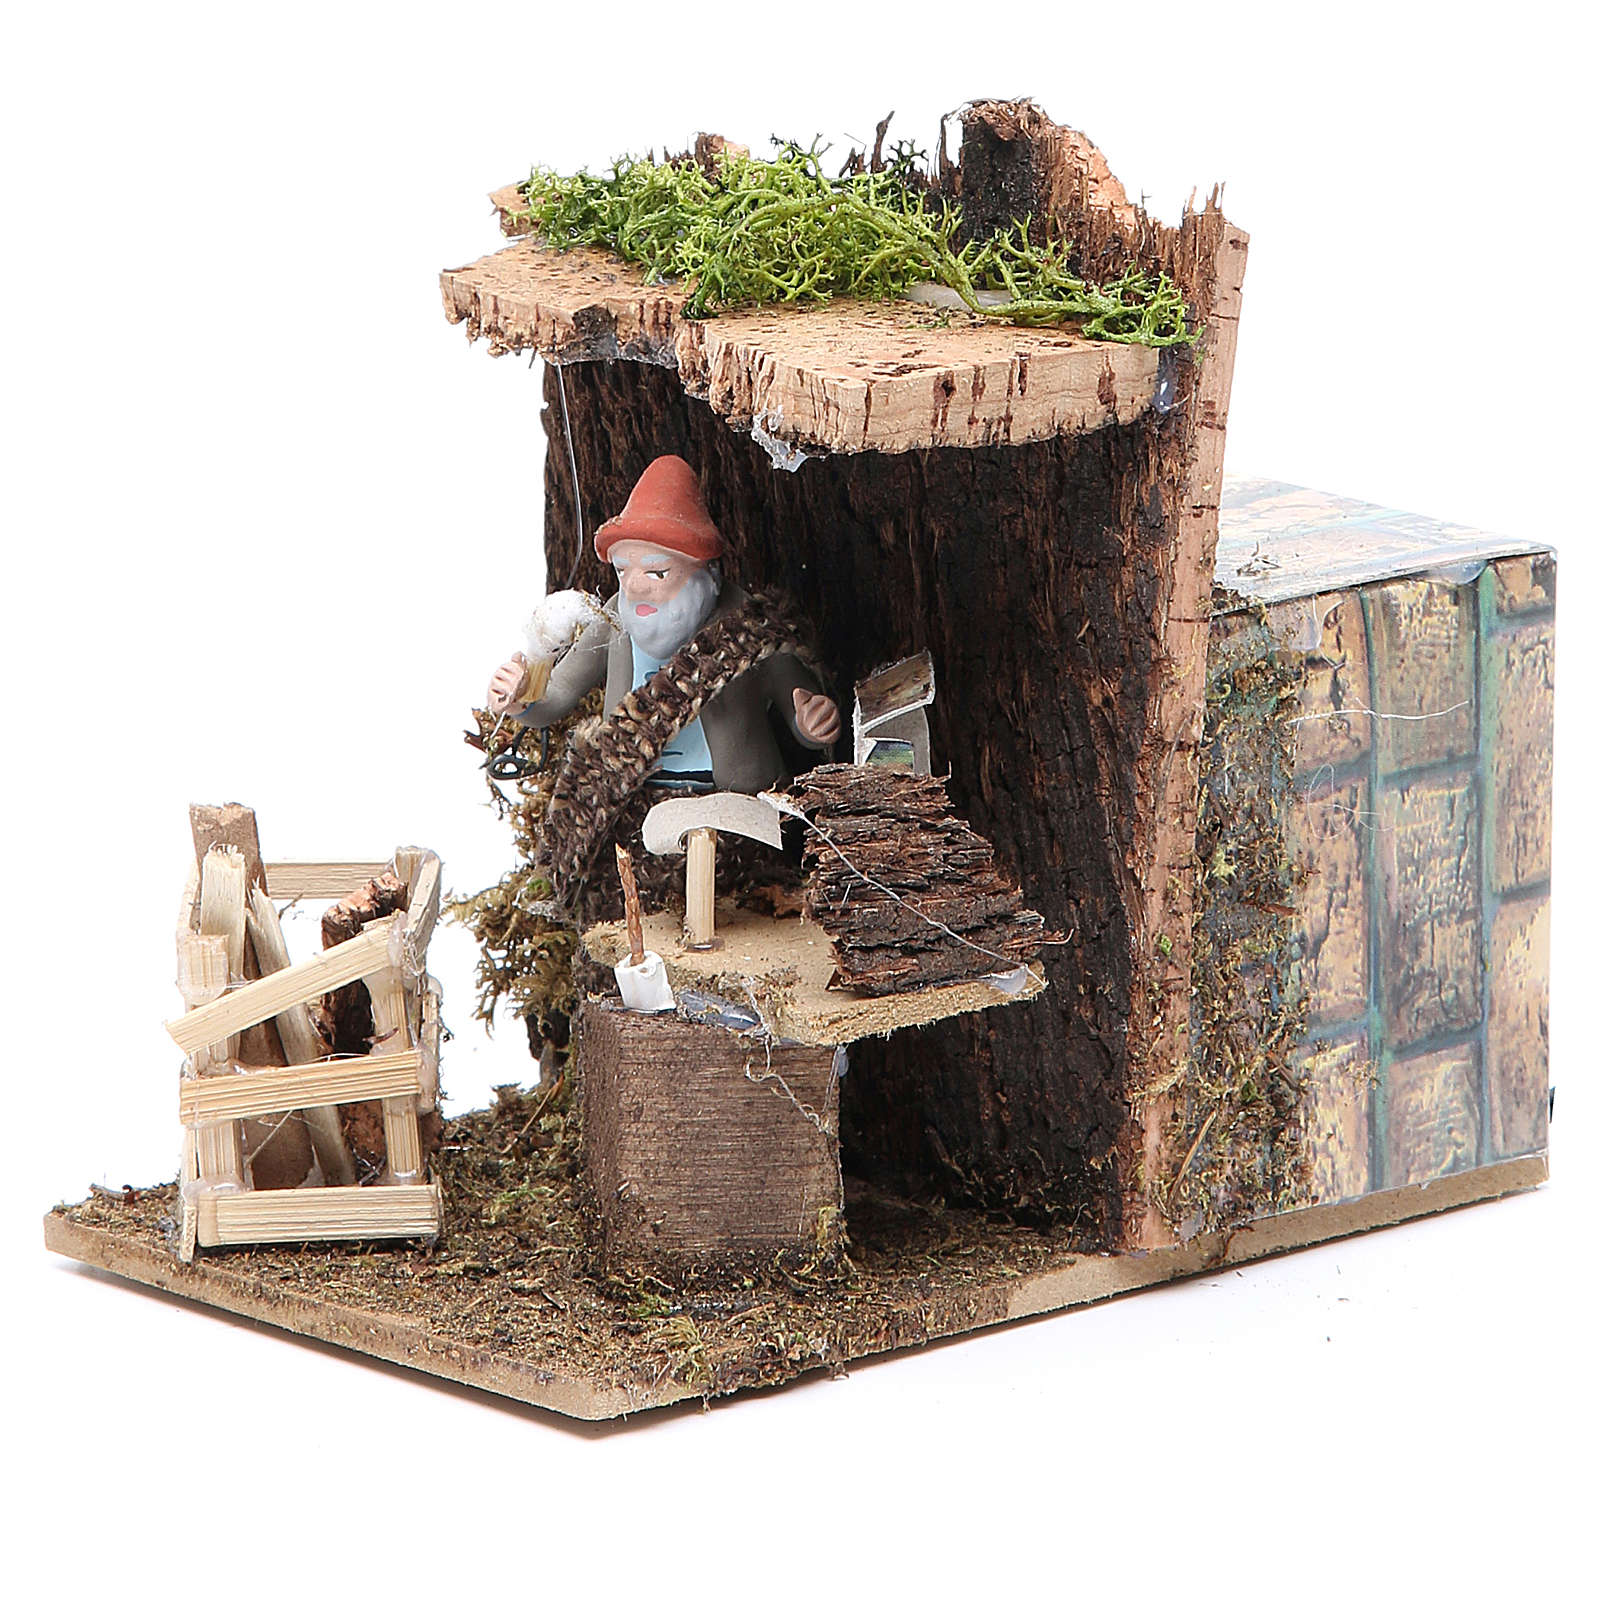 Nativity artist measuring 7cm, animated nativity figurine 3